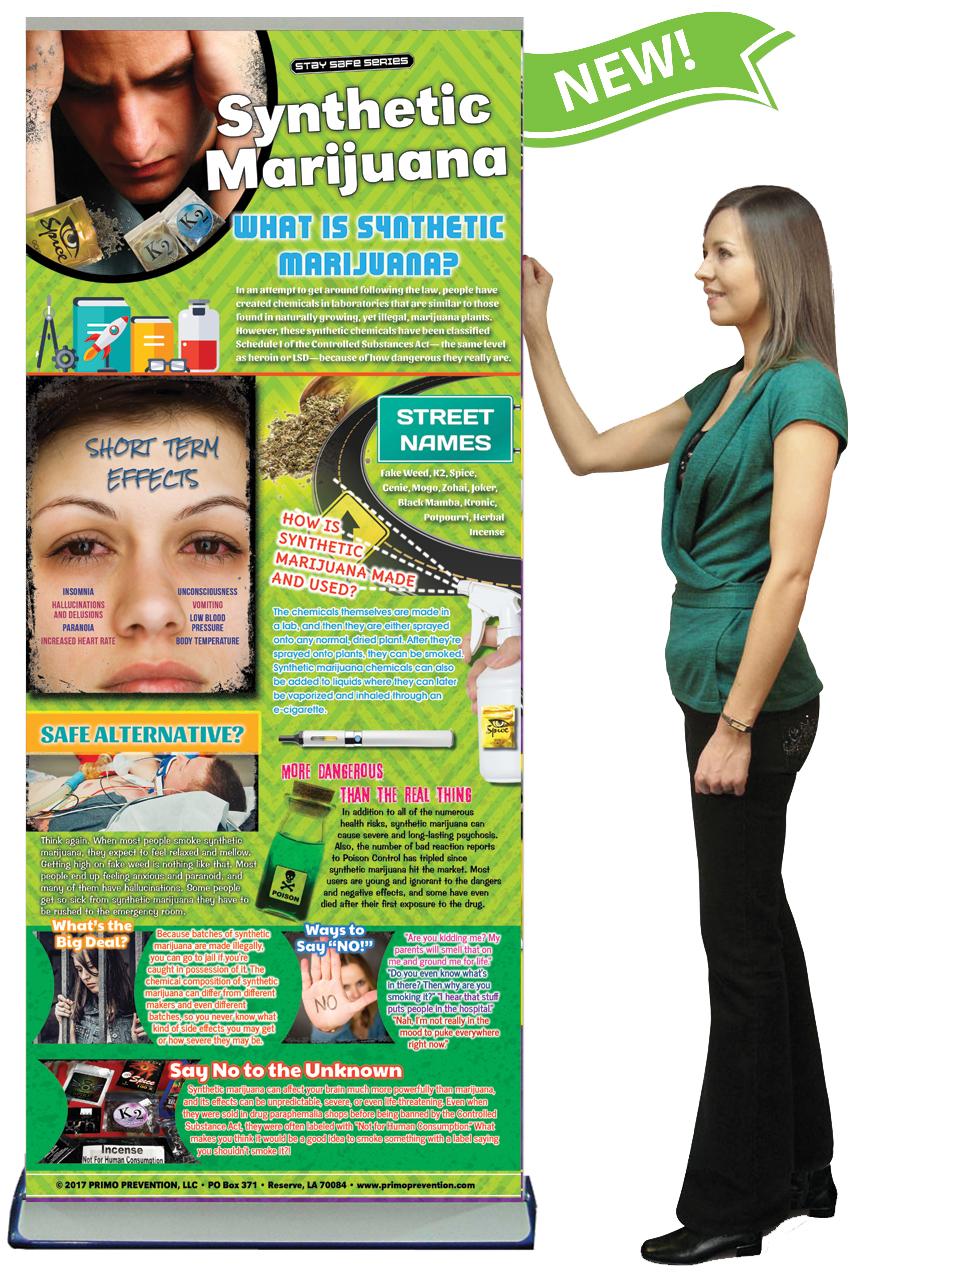 PSS-DA-BAN20-Synthetic-Marijuana-newgirl